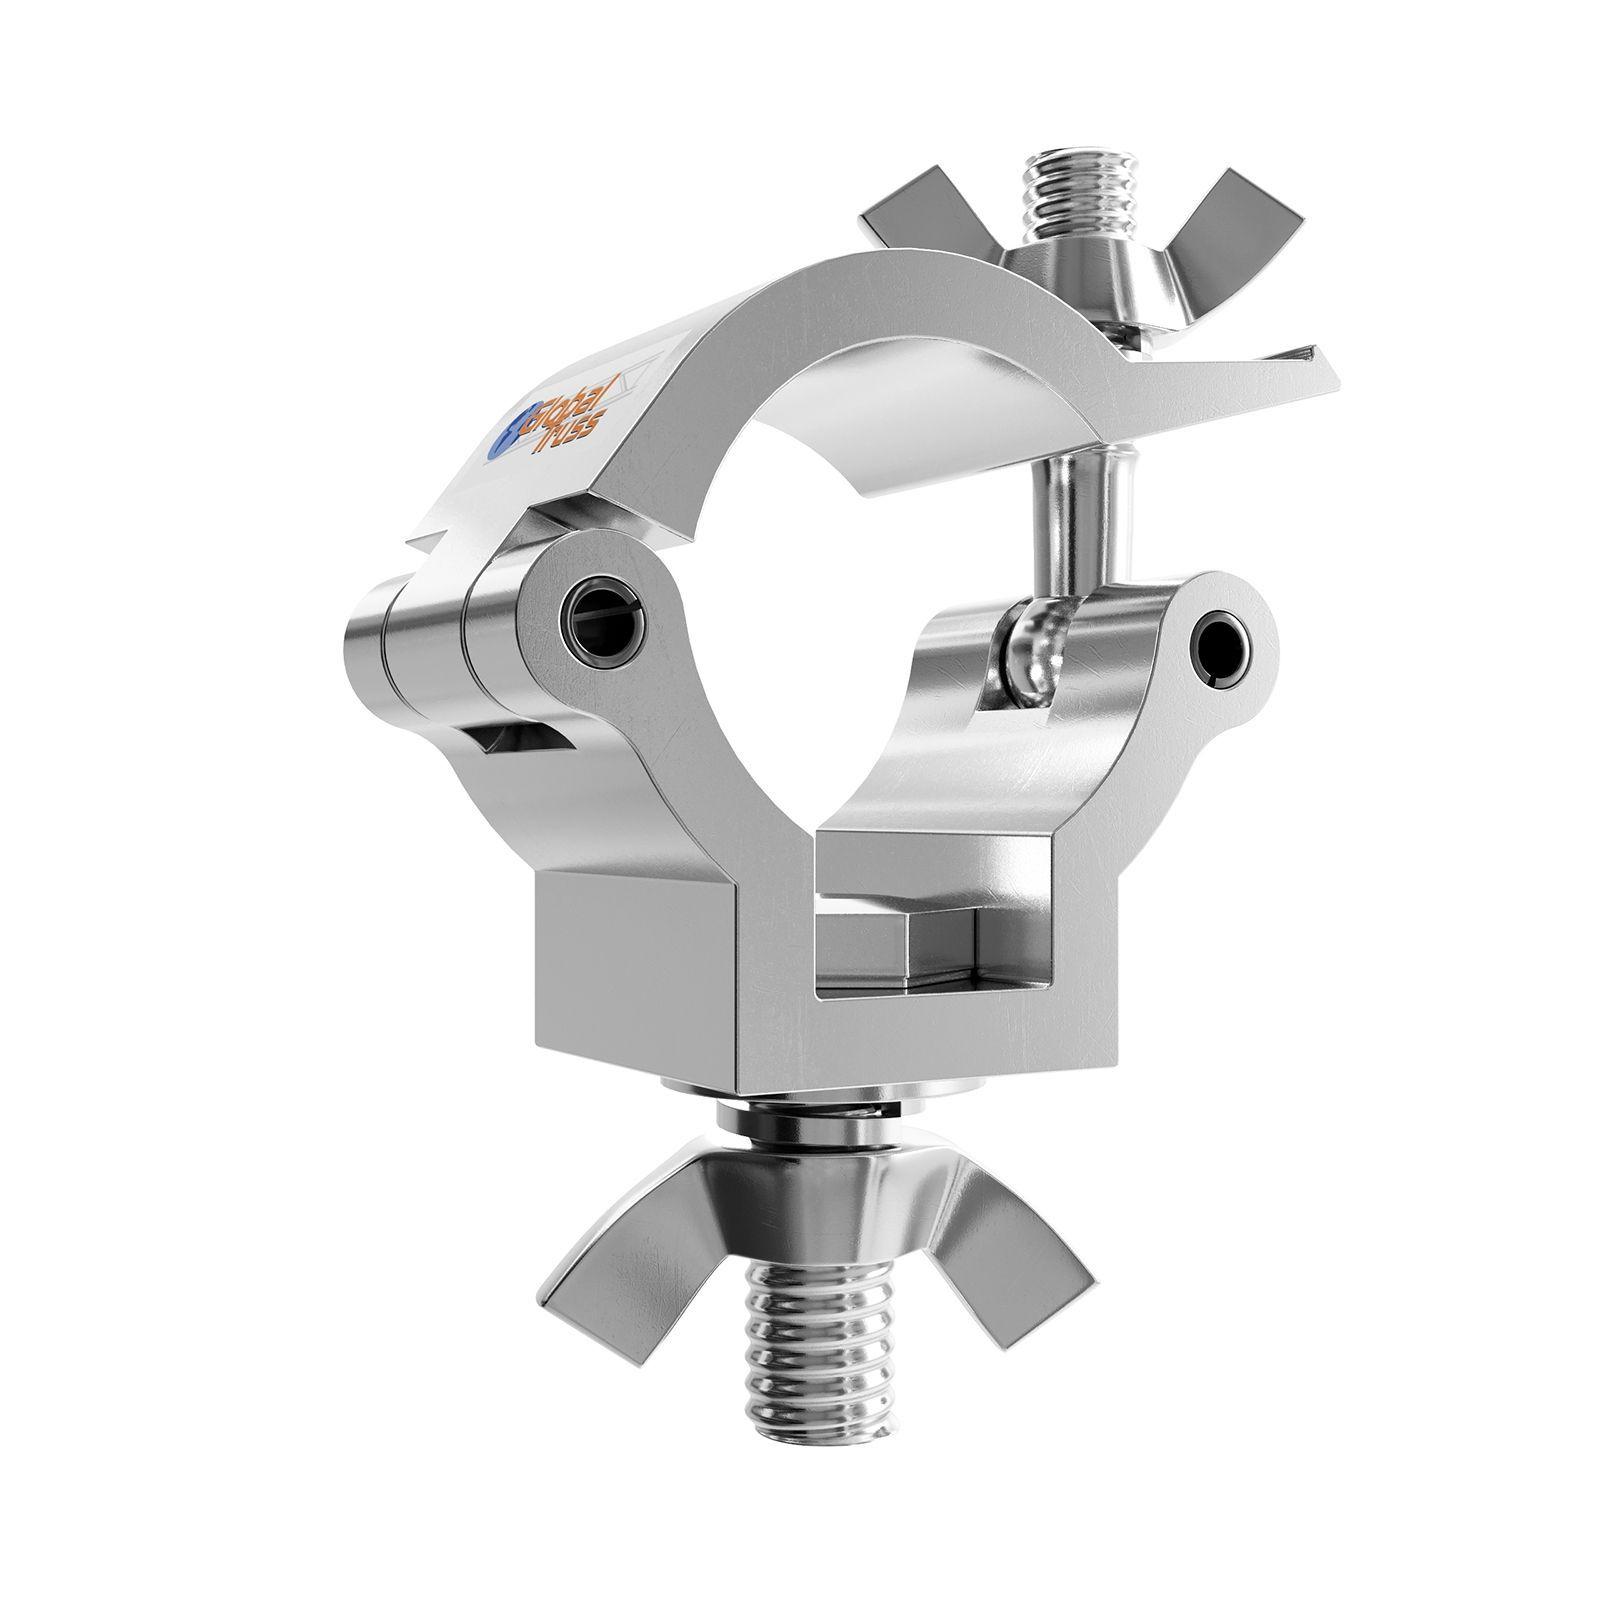 Global Truss 5036 Half-Coupler Small 32 - 35mm /30/75kg